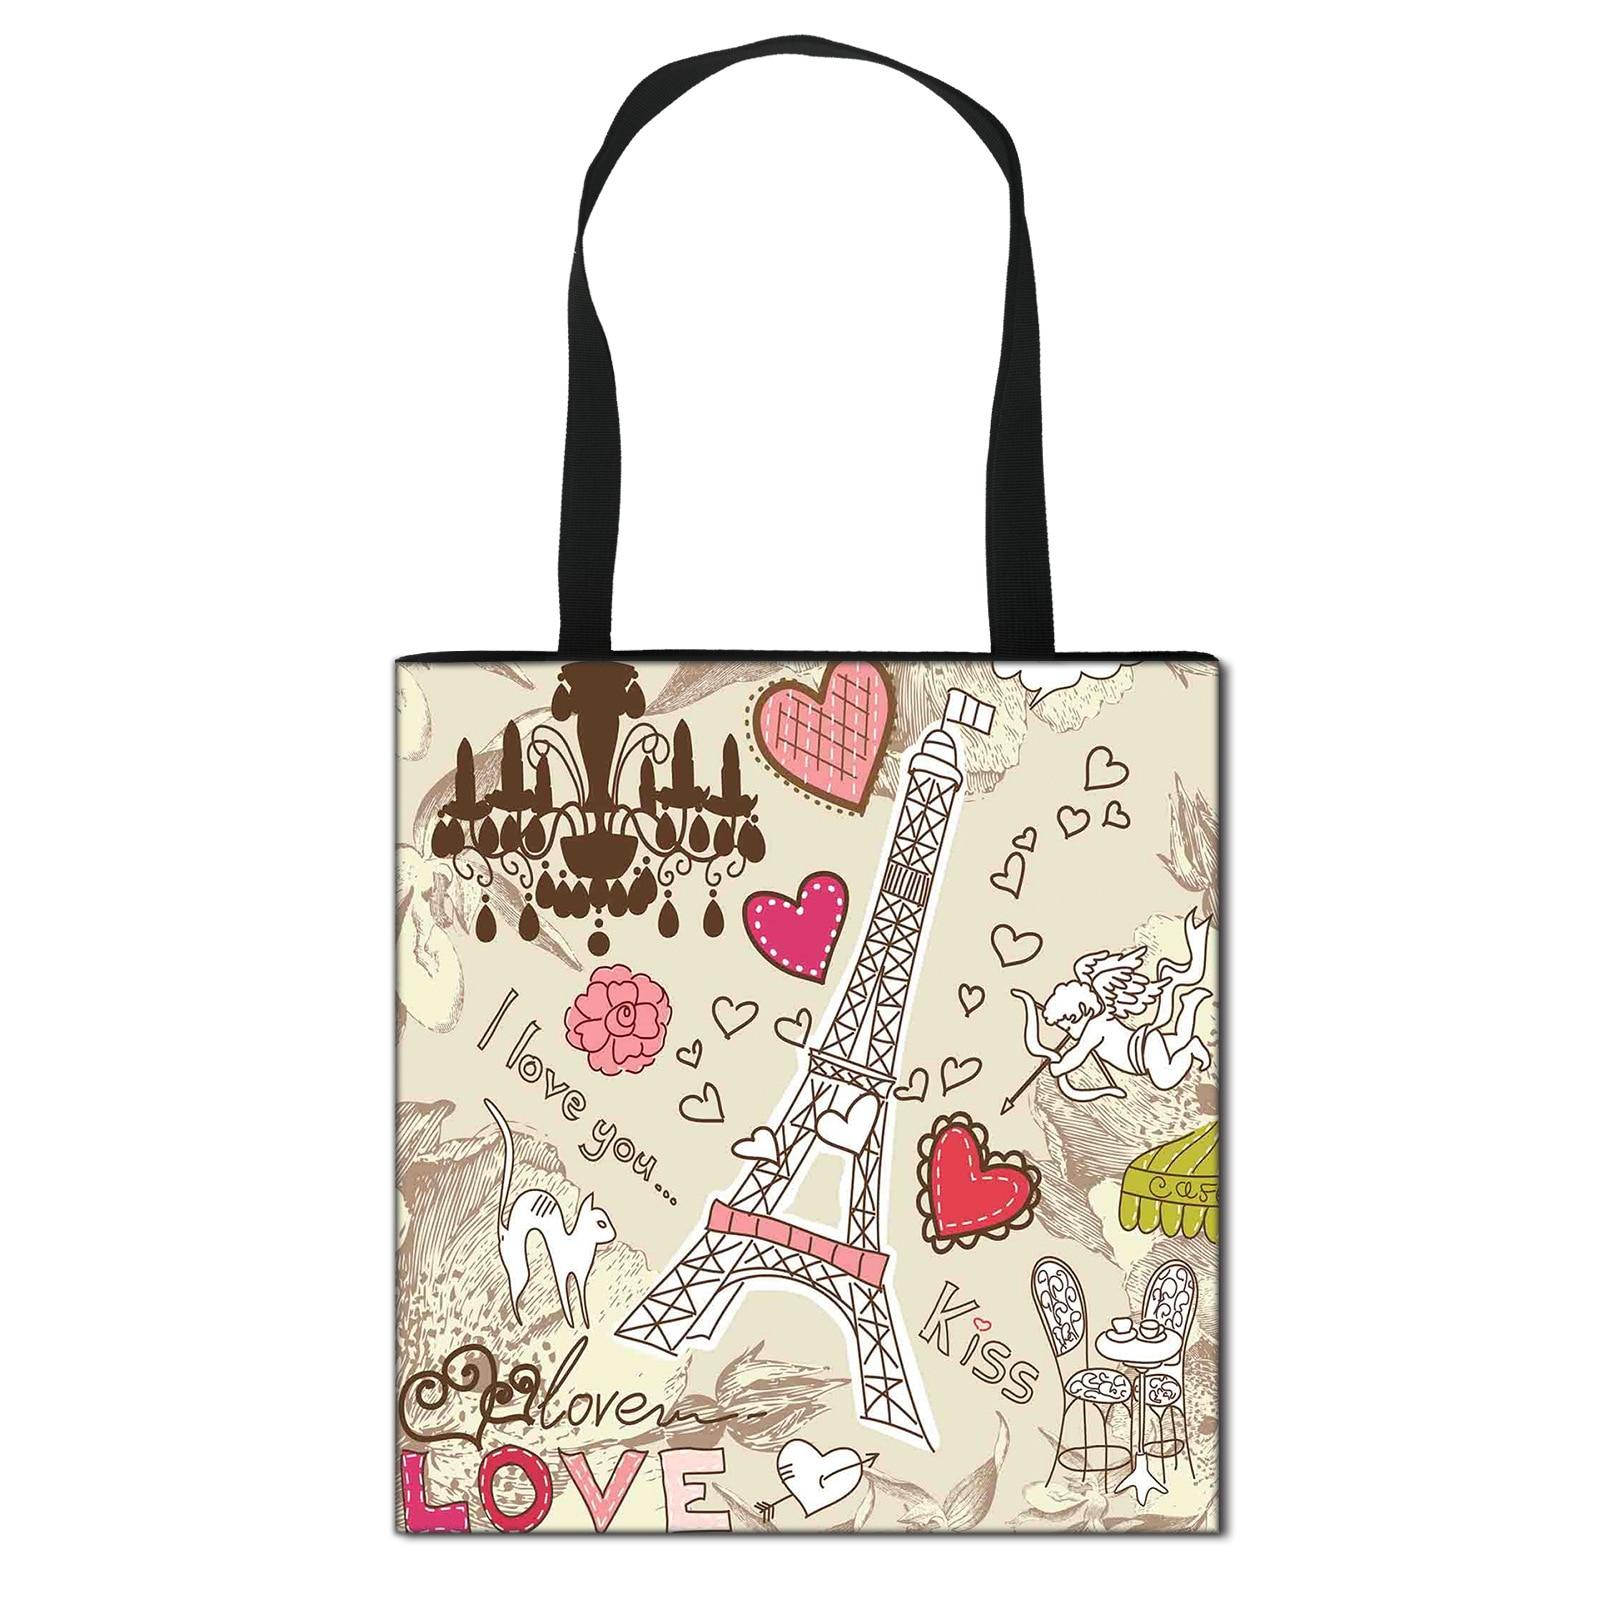 Eiffel Tower Girls Crossbody Bag Women Portable Shopping Travel Bags Large Capacity Storage Bags Book Bags Female